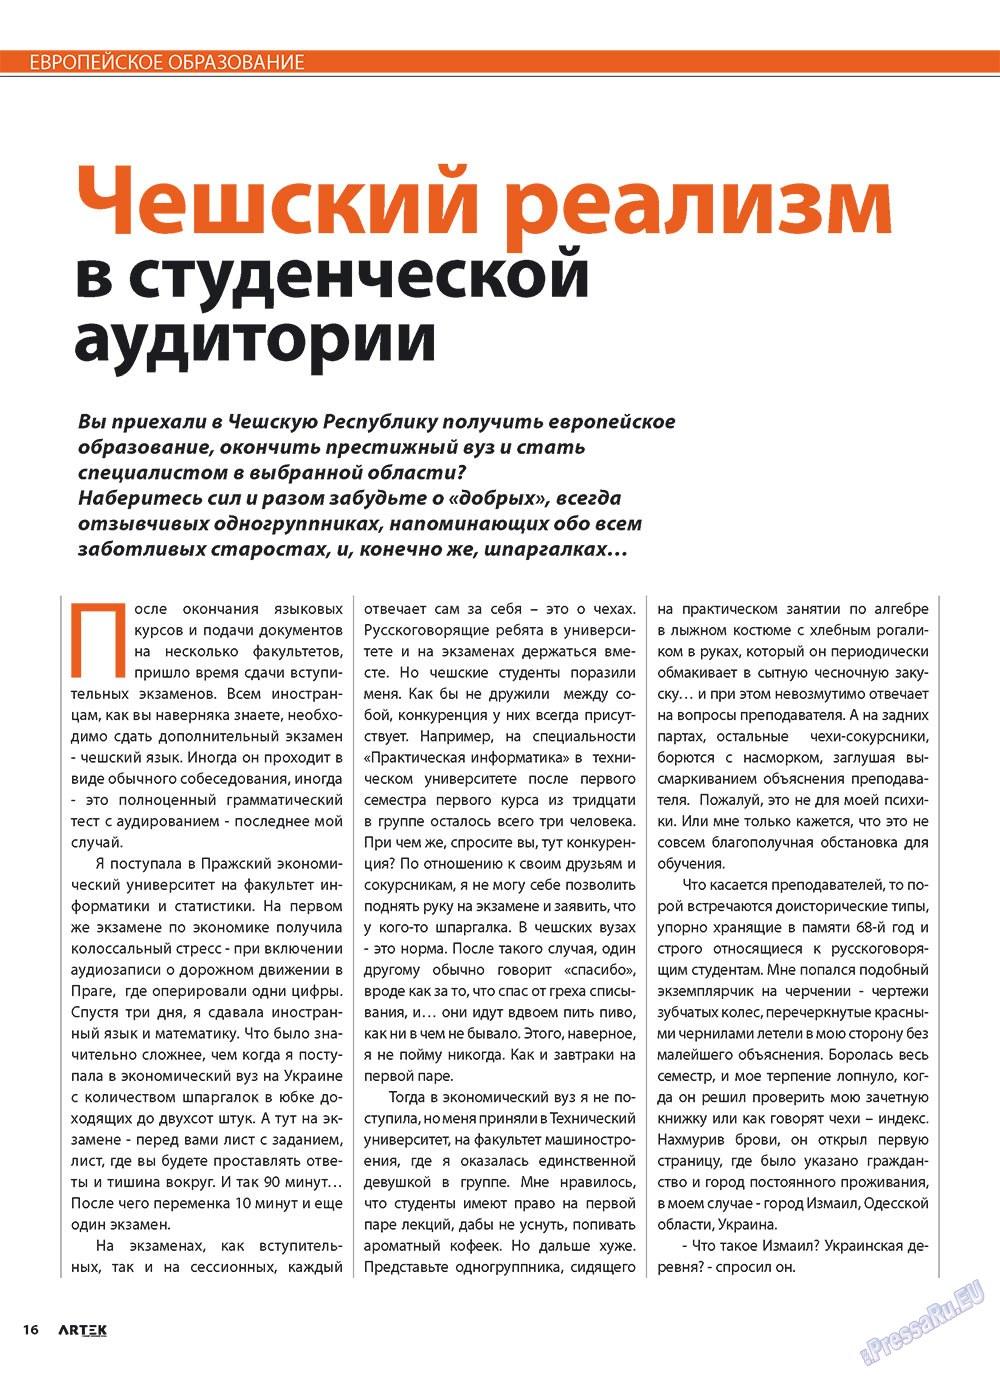 Артек (журнал). 2010 год, номер 3, стр. 18